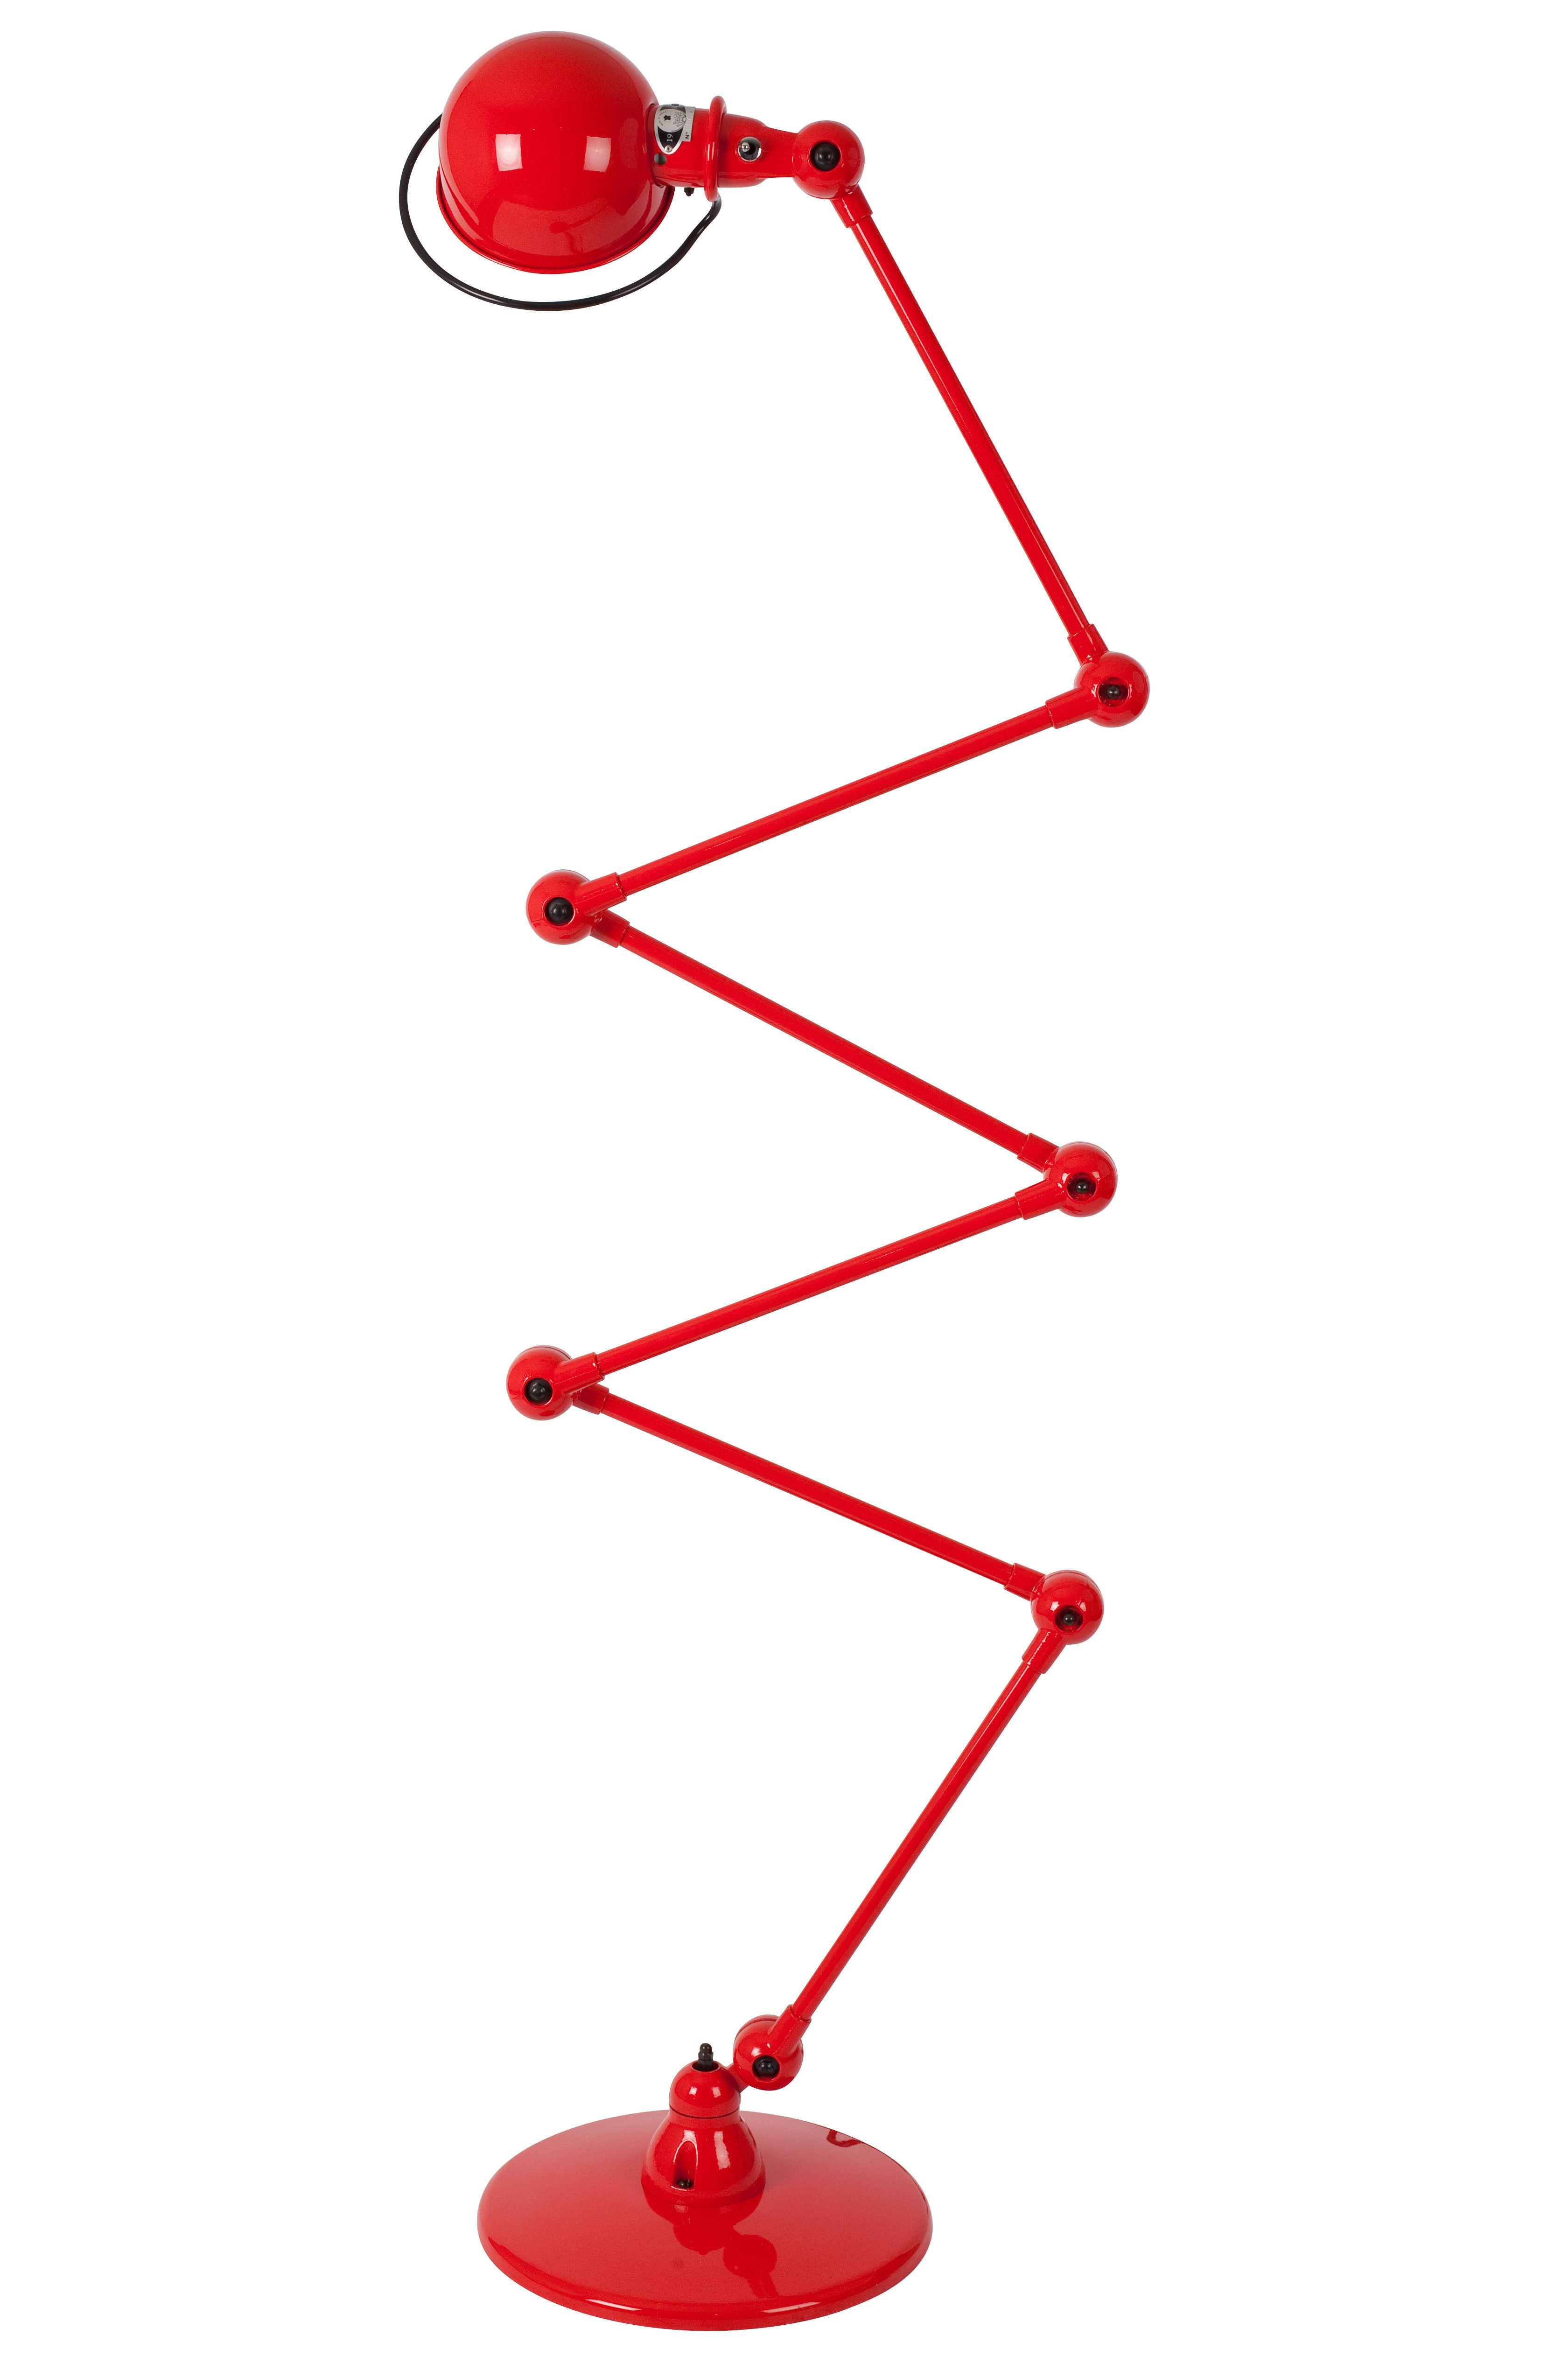 Lighting - Floor lamps - Loft Zigzag Floor lamp - 6 arms - H max 240 cm by Jieldé - Red - Stainless steel